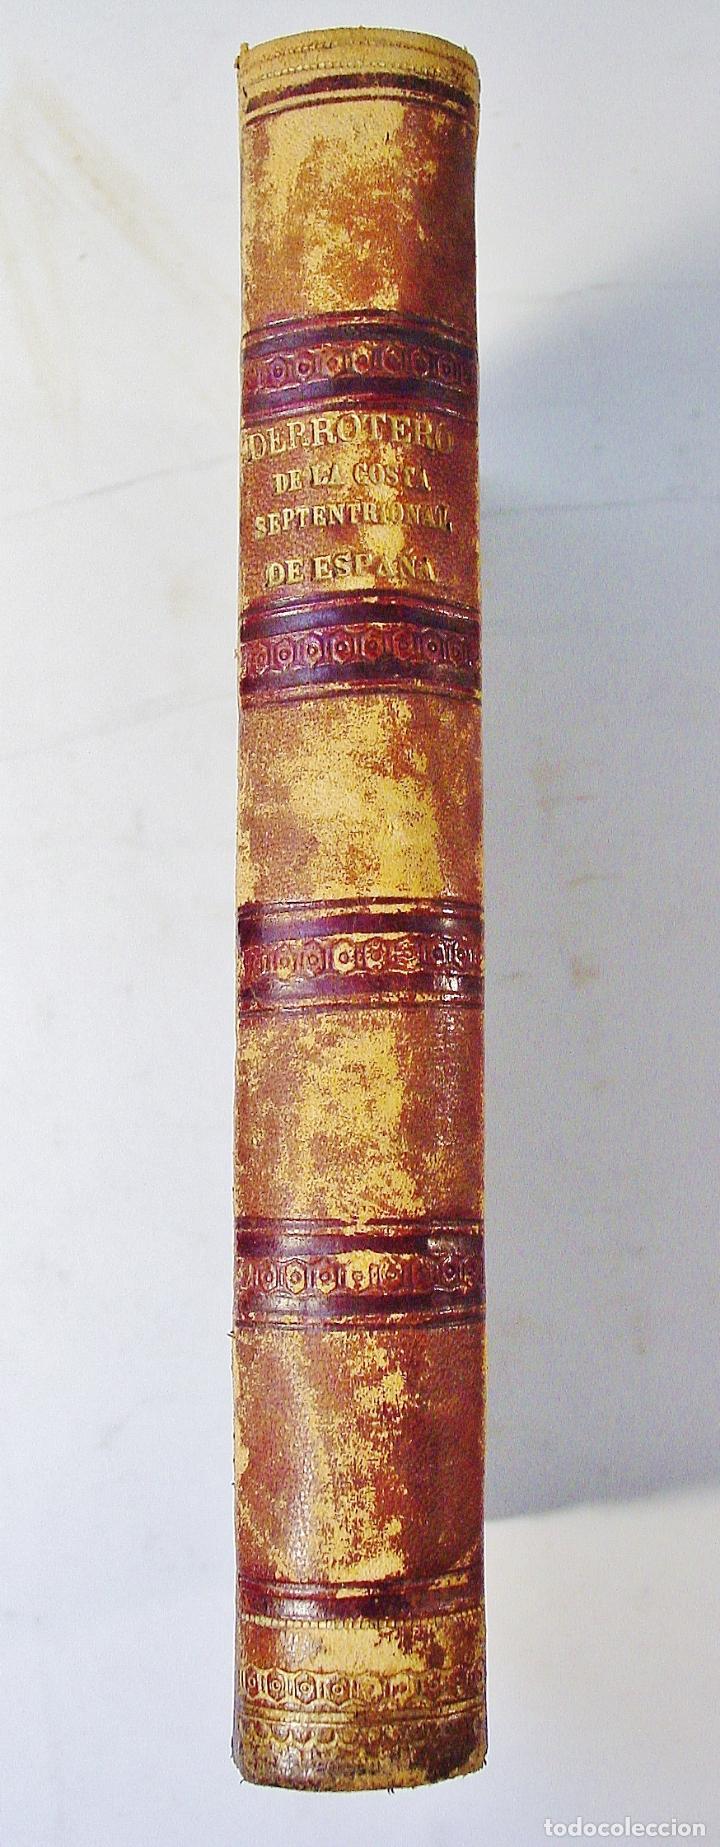 Libros antiguos: DERROTERO DE LA COSTA SEPTENTRIONAL DE ESPAÑA. PARTE PRIMERA. AÑO 1860. DE CORUÑA A GIJÓN. - Foto 6 - 86018052